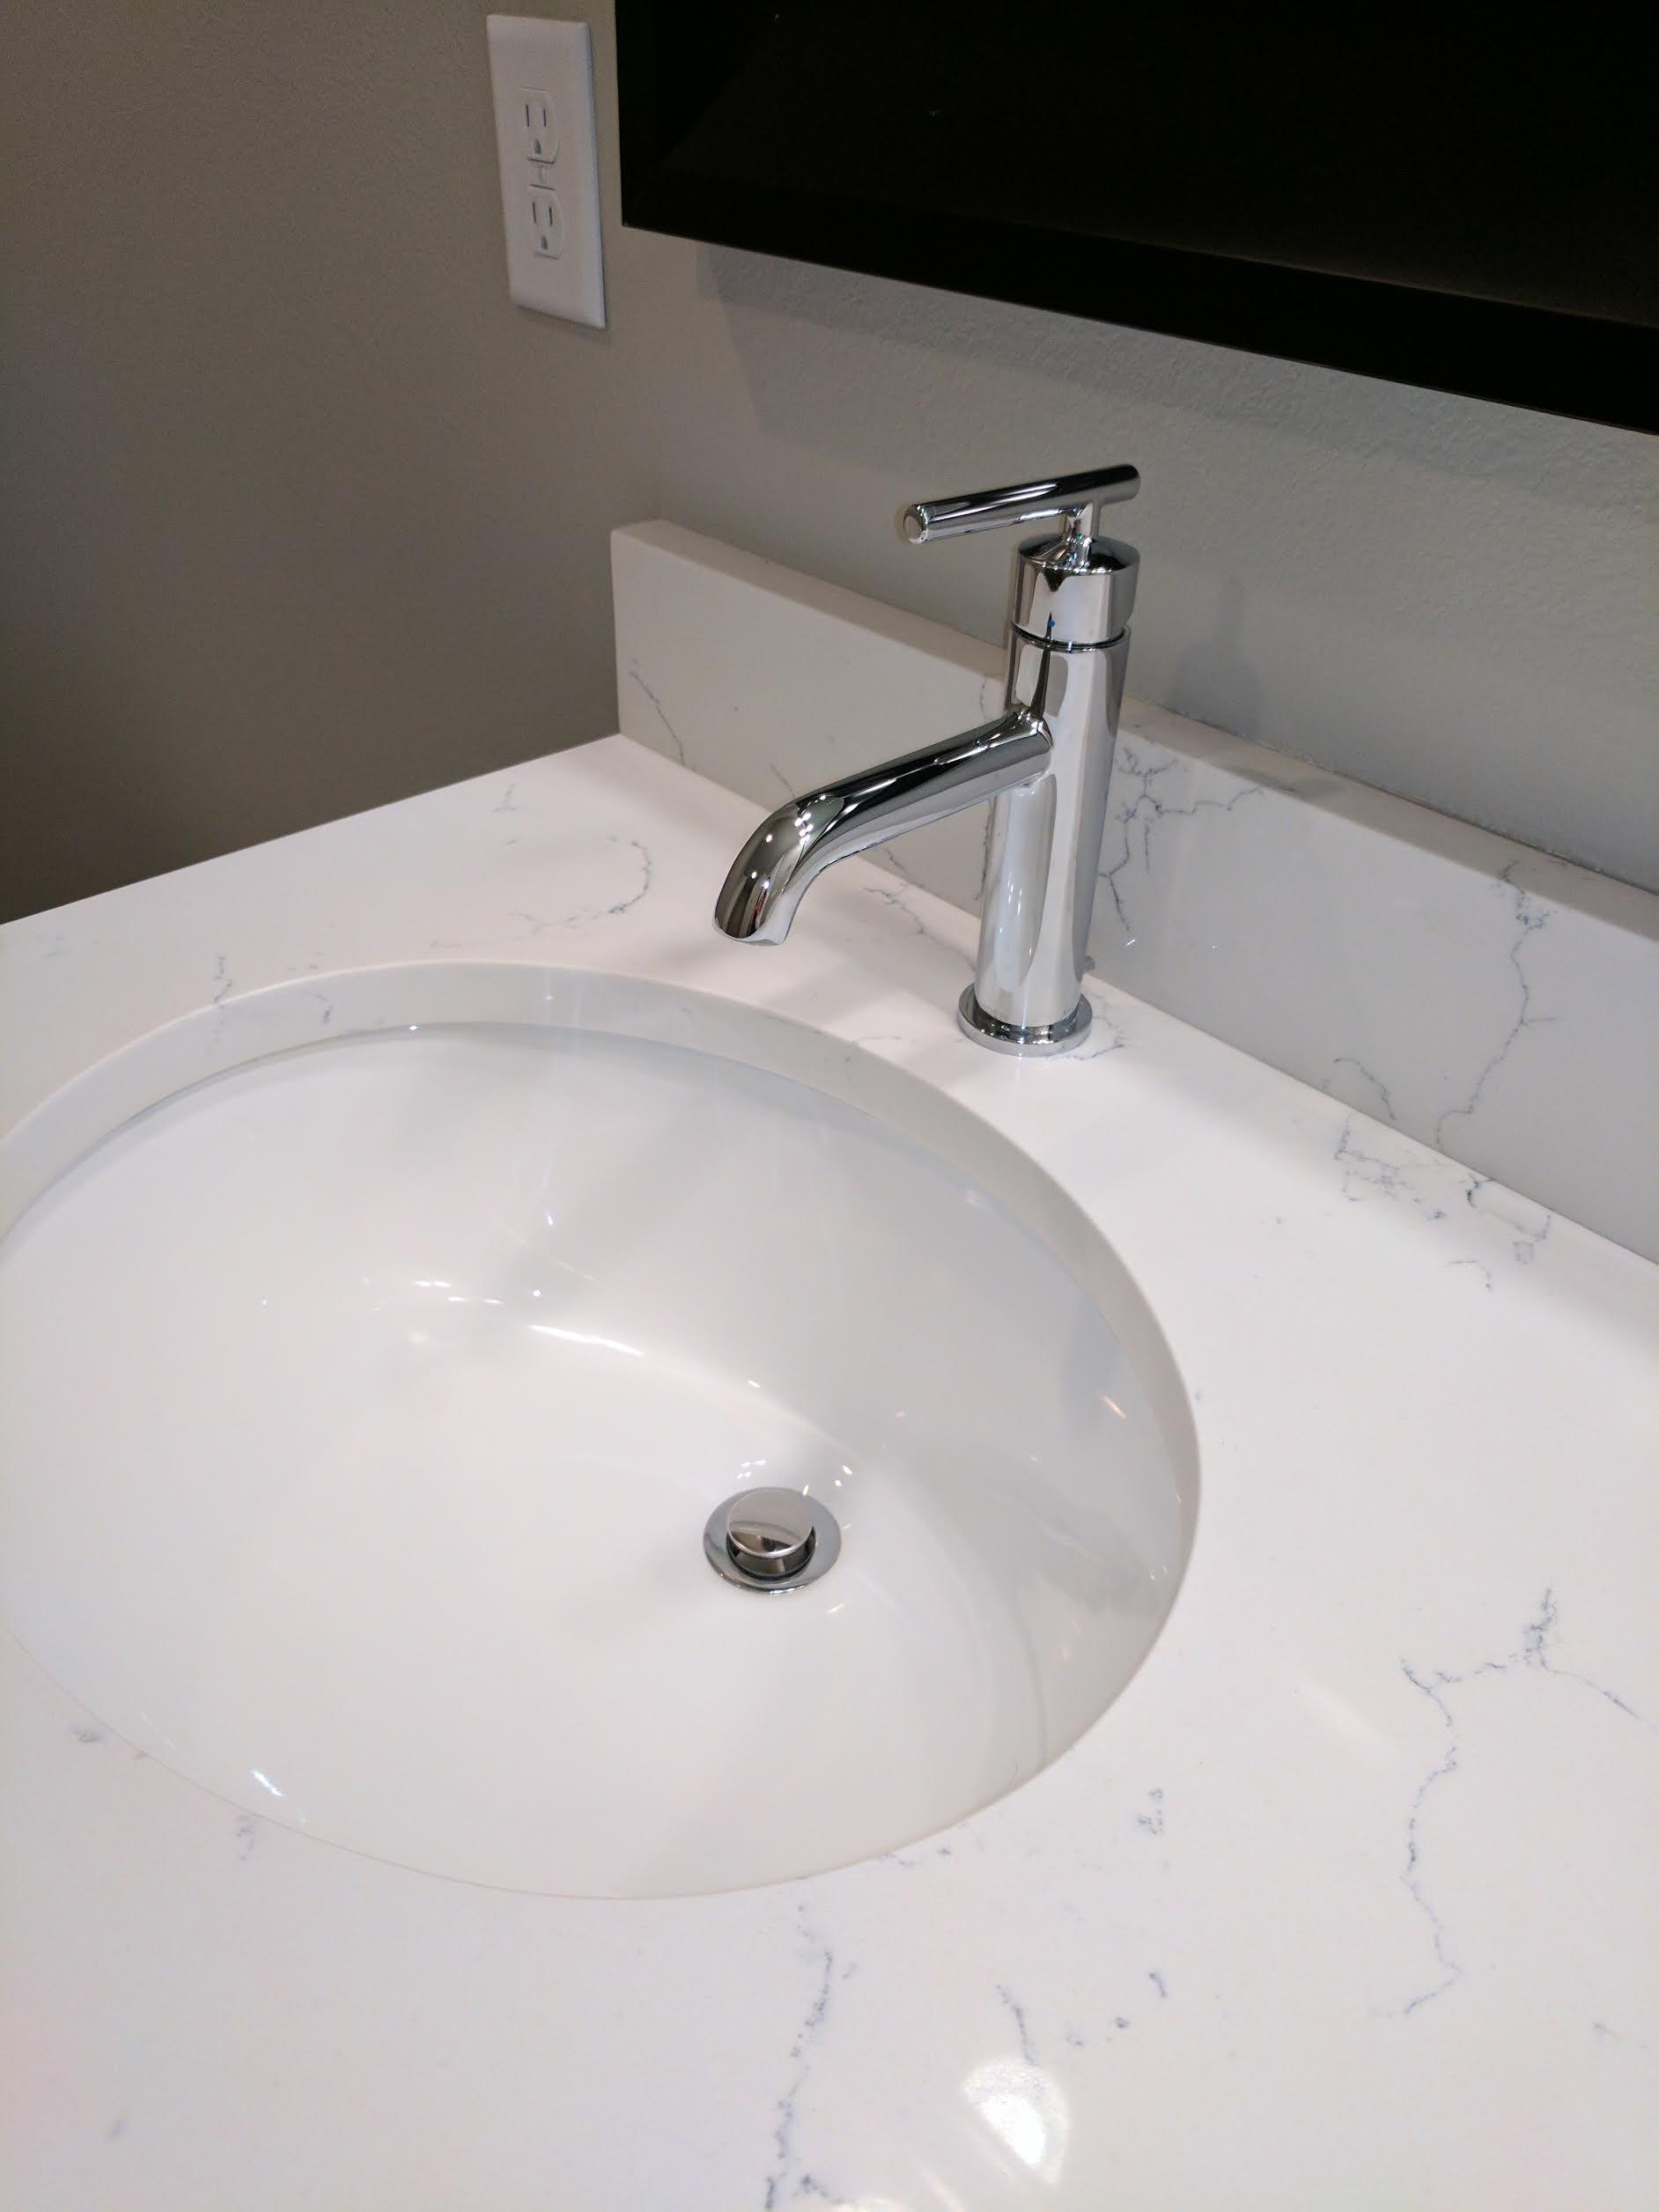 Bathroom Fixtures Billings Mt 3629 colton boulevard – better building technologies – corporate